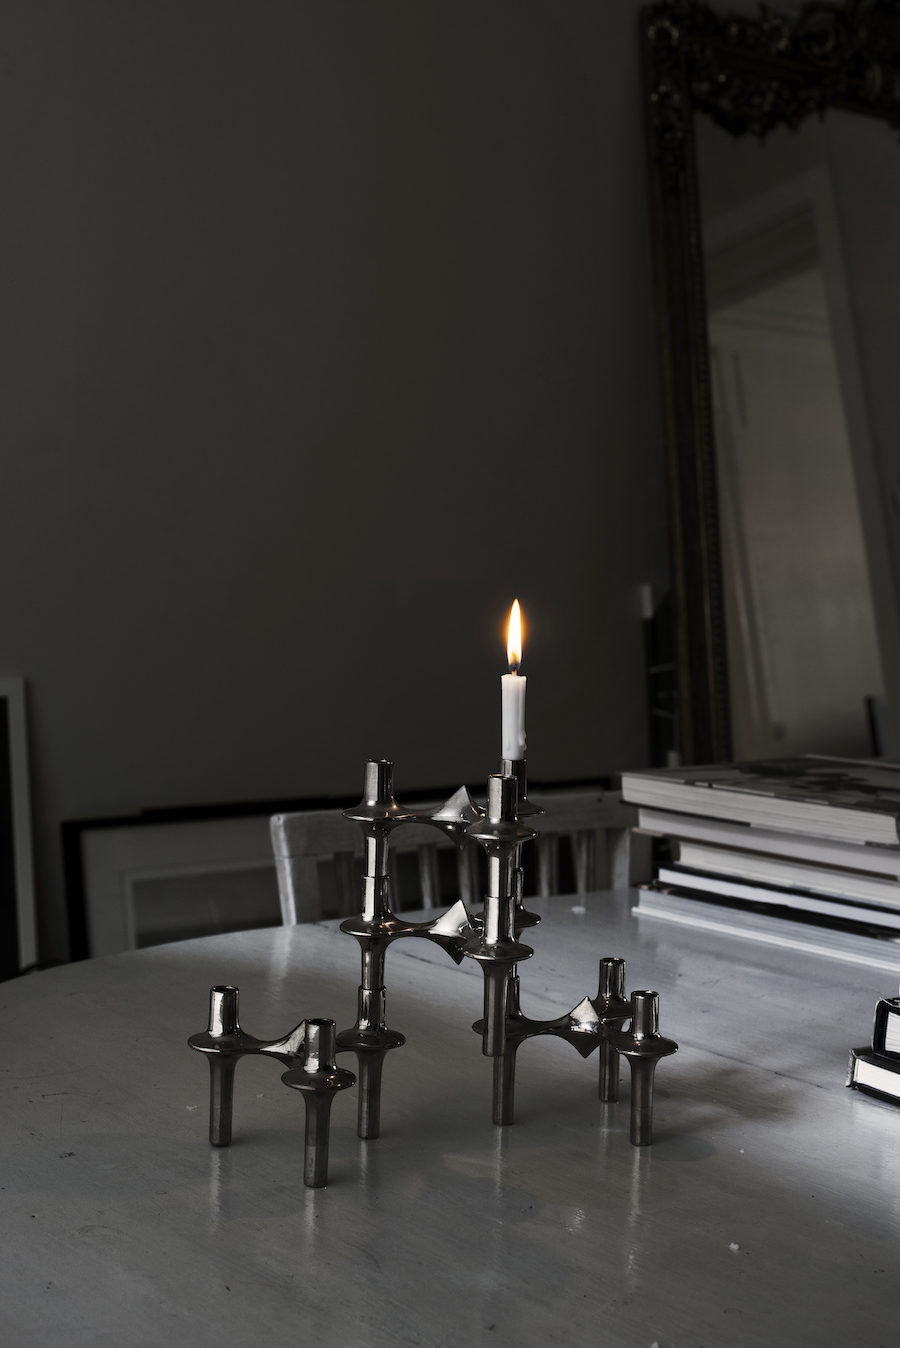 Bild på Nagel-ljusstake hemma hos Michelle Meadows.